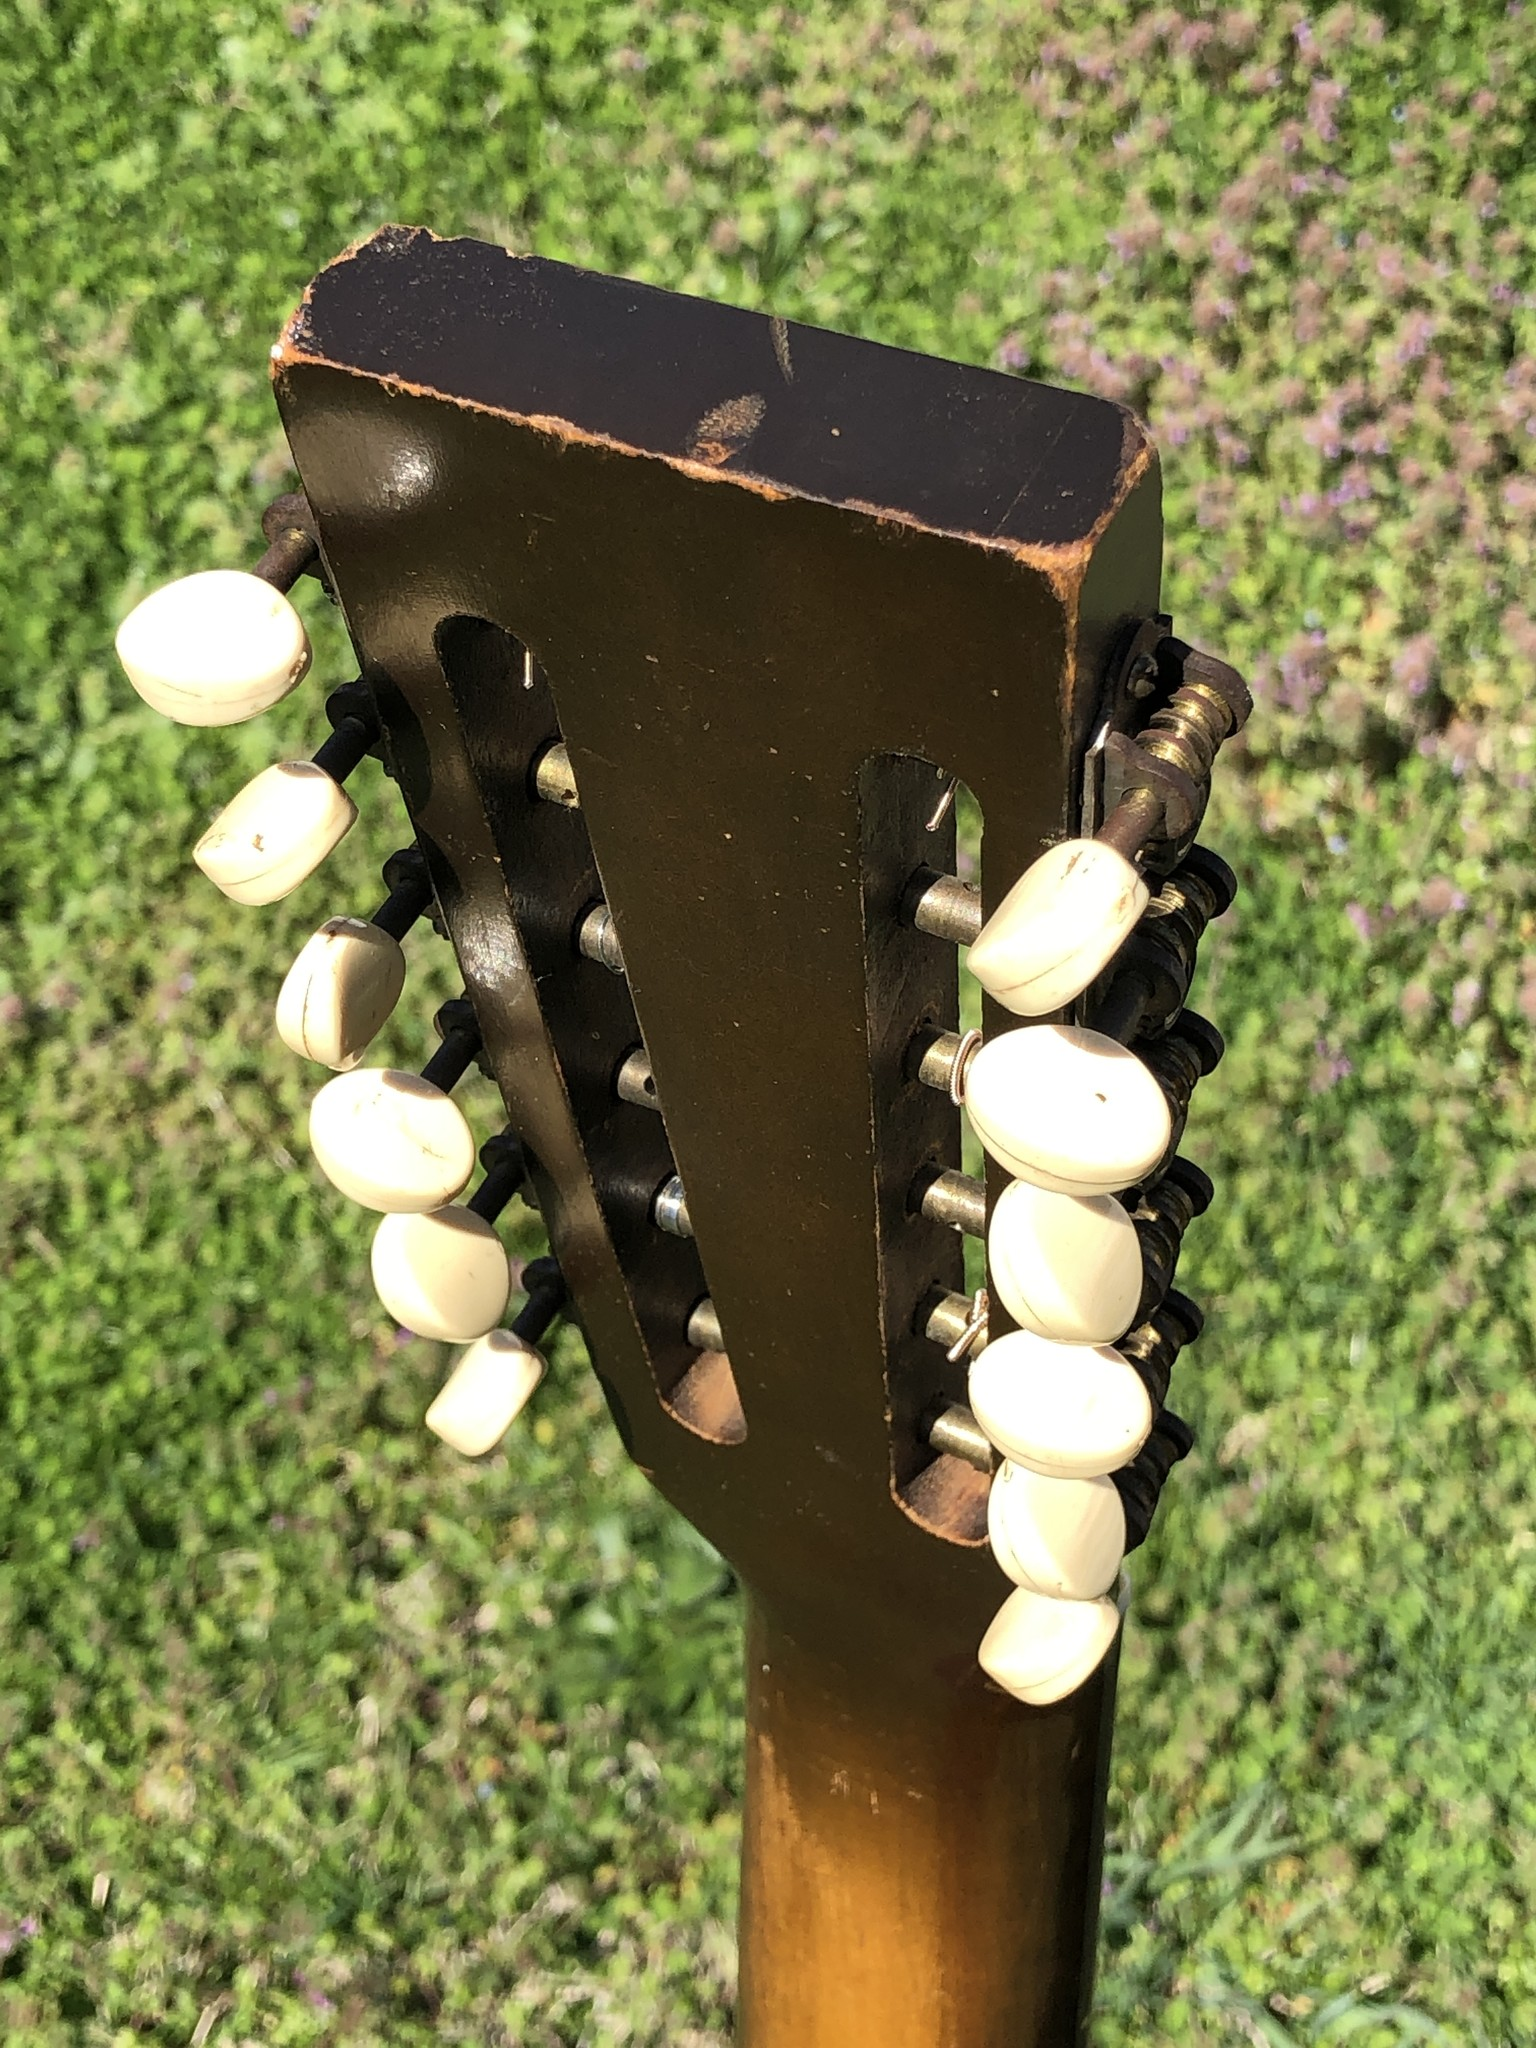 1960s Stella 12-string (strung up for 6 string) 7164 H922-7